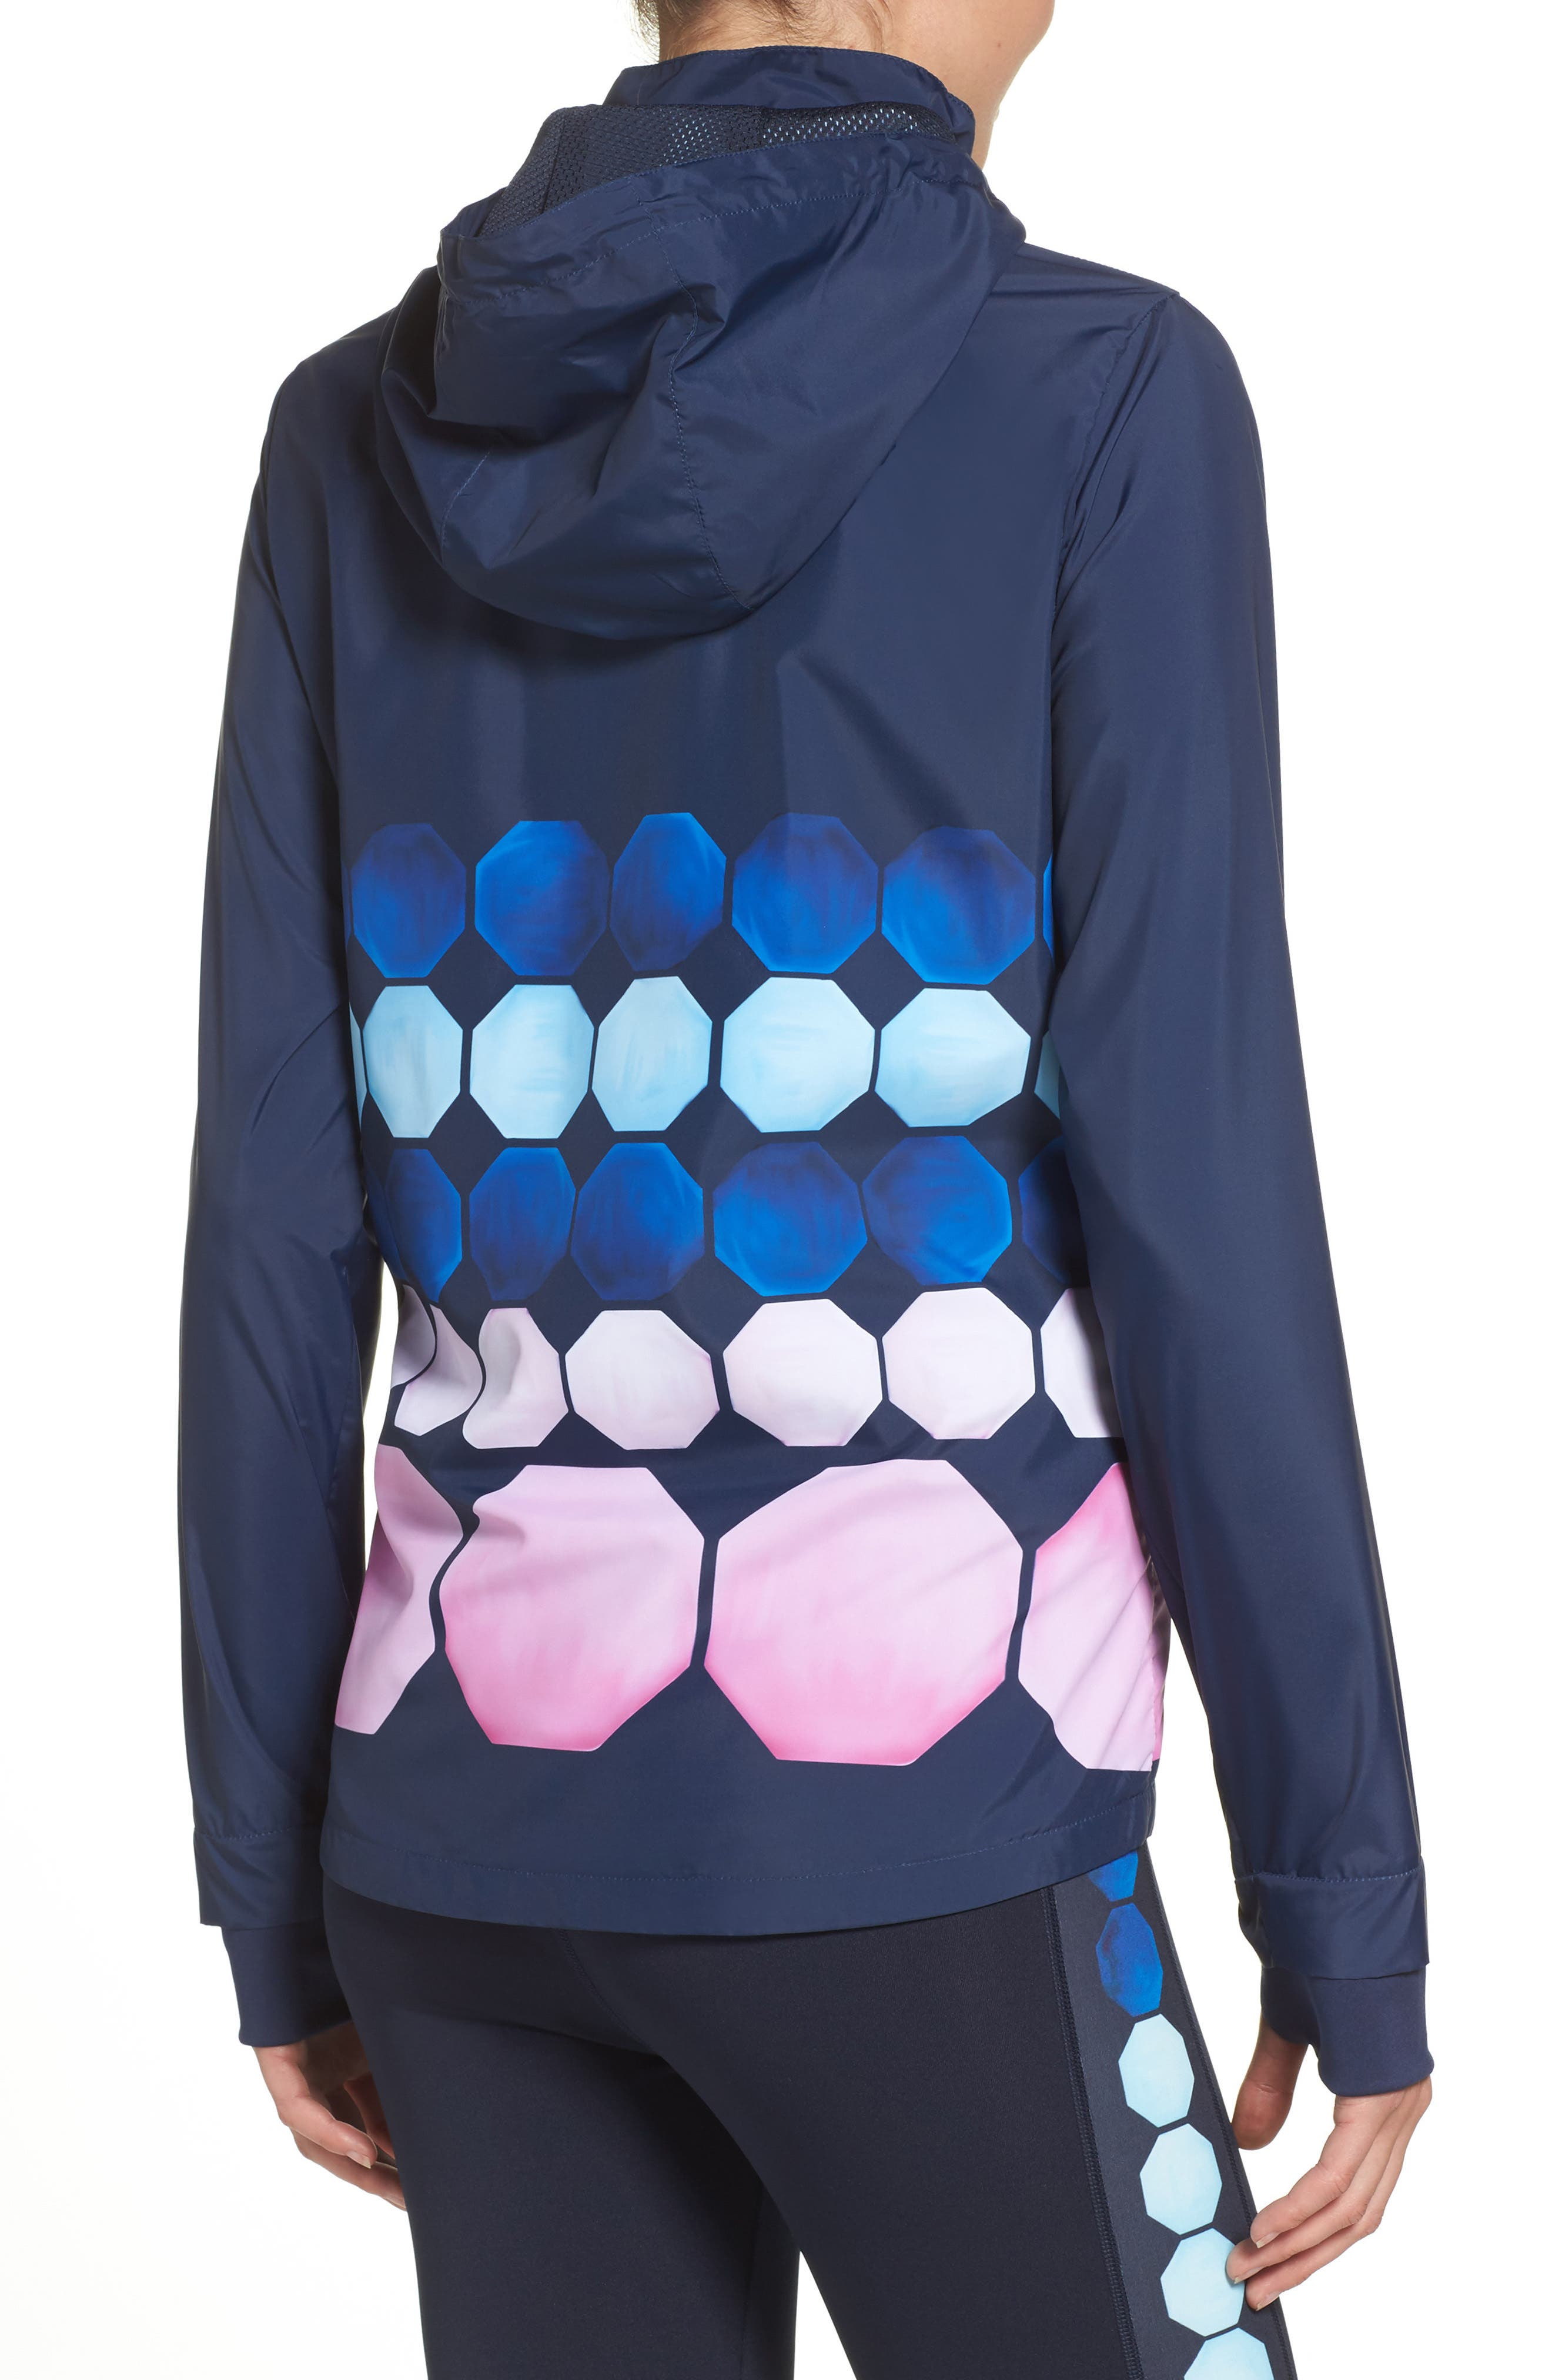 Marina Mosaic Hooded Jacket,                             Alternate thumbnail 2, color,                             Navy